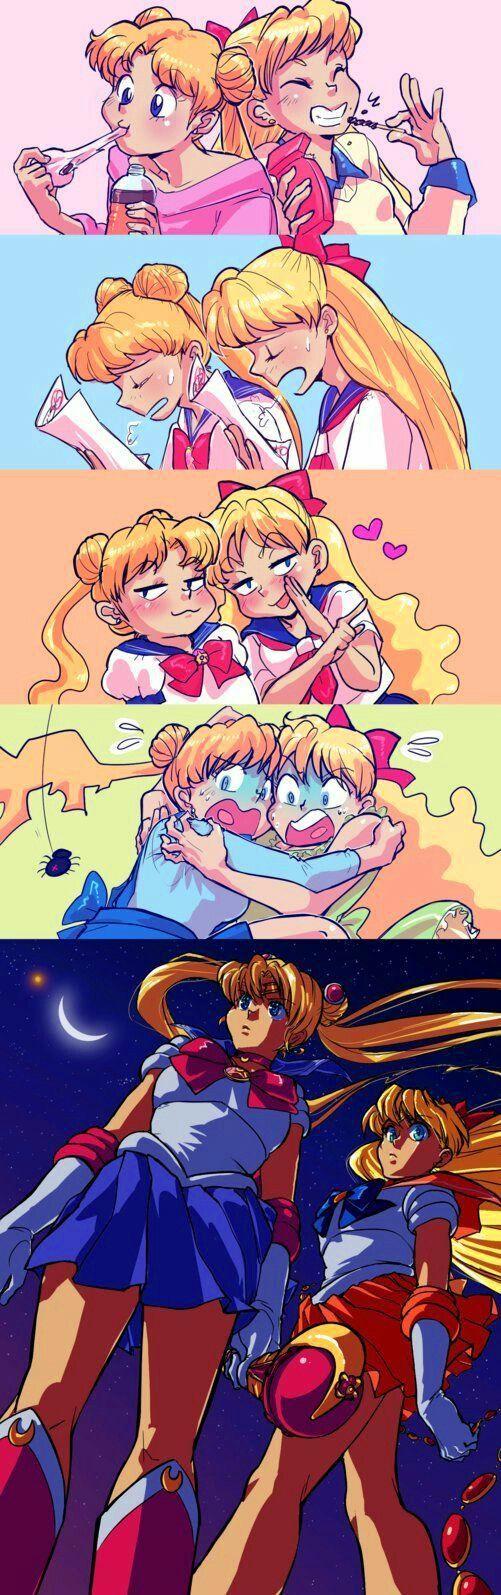 TWINSIES! Mina and Usagi